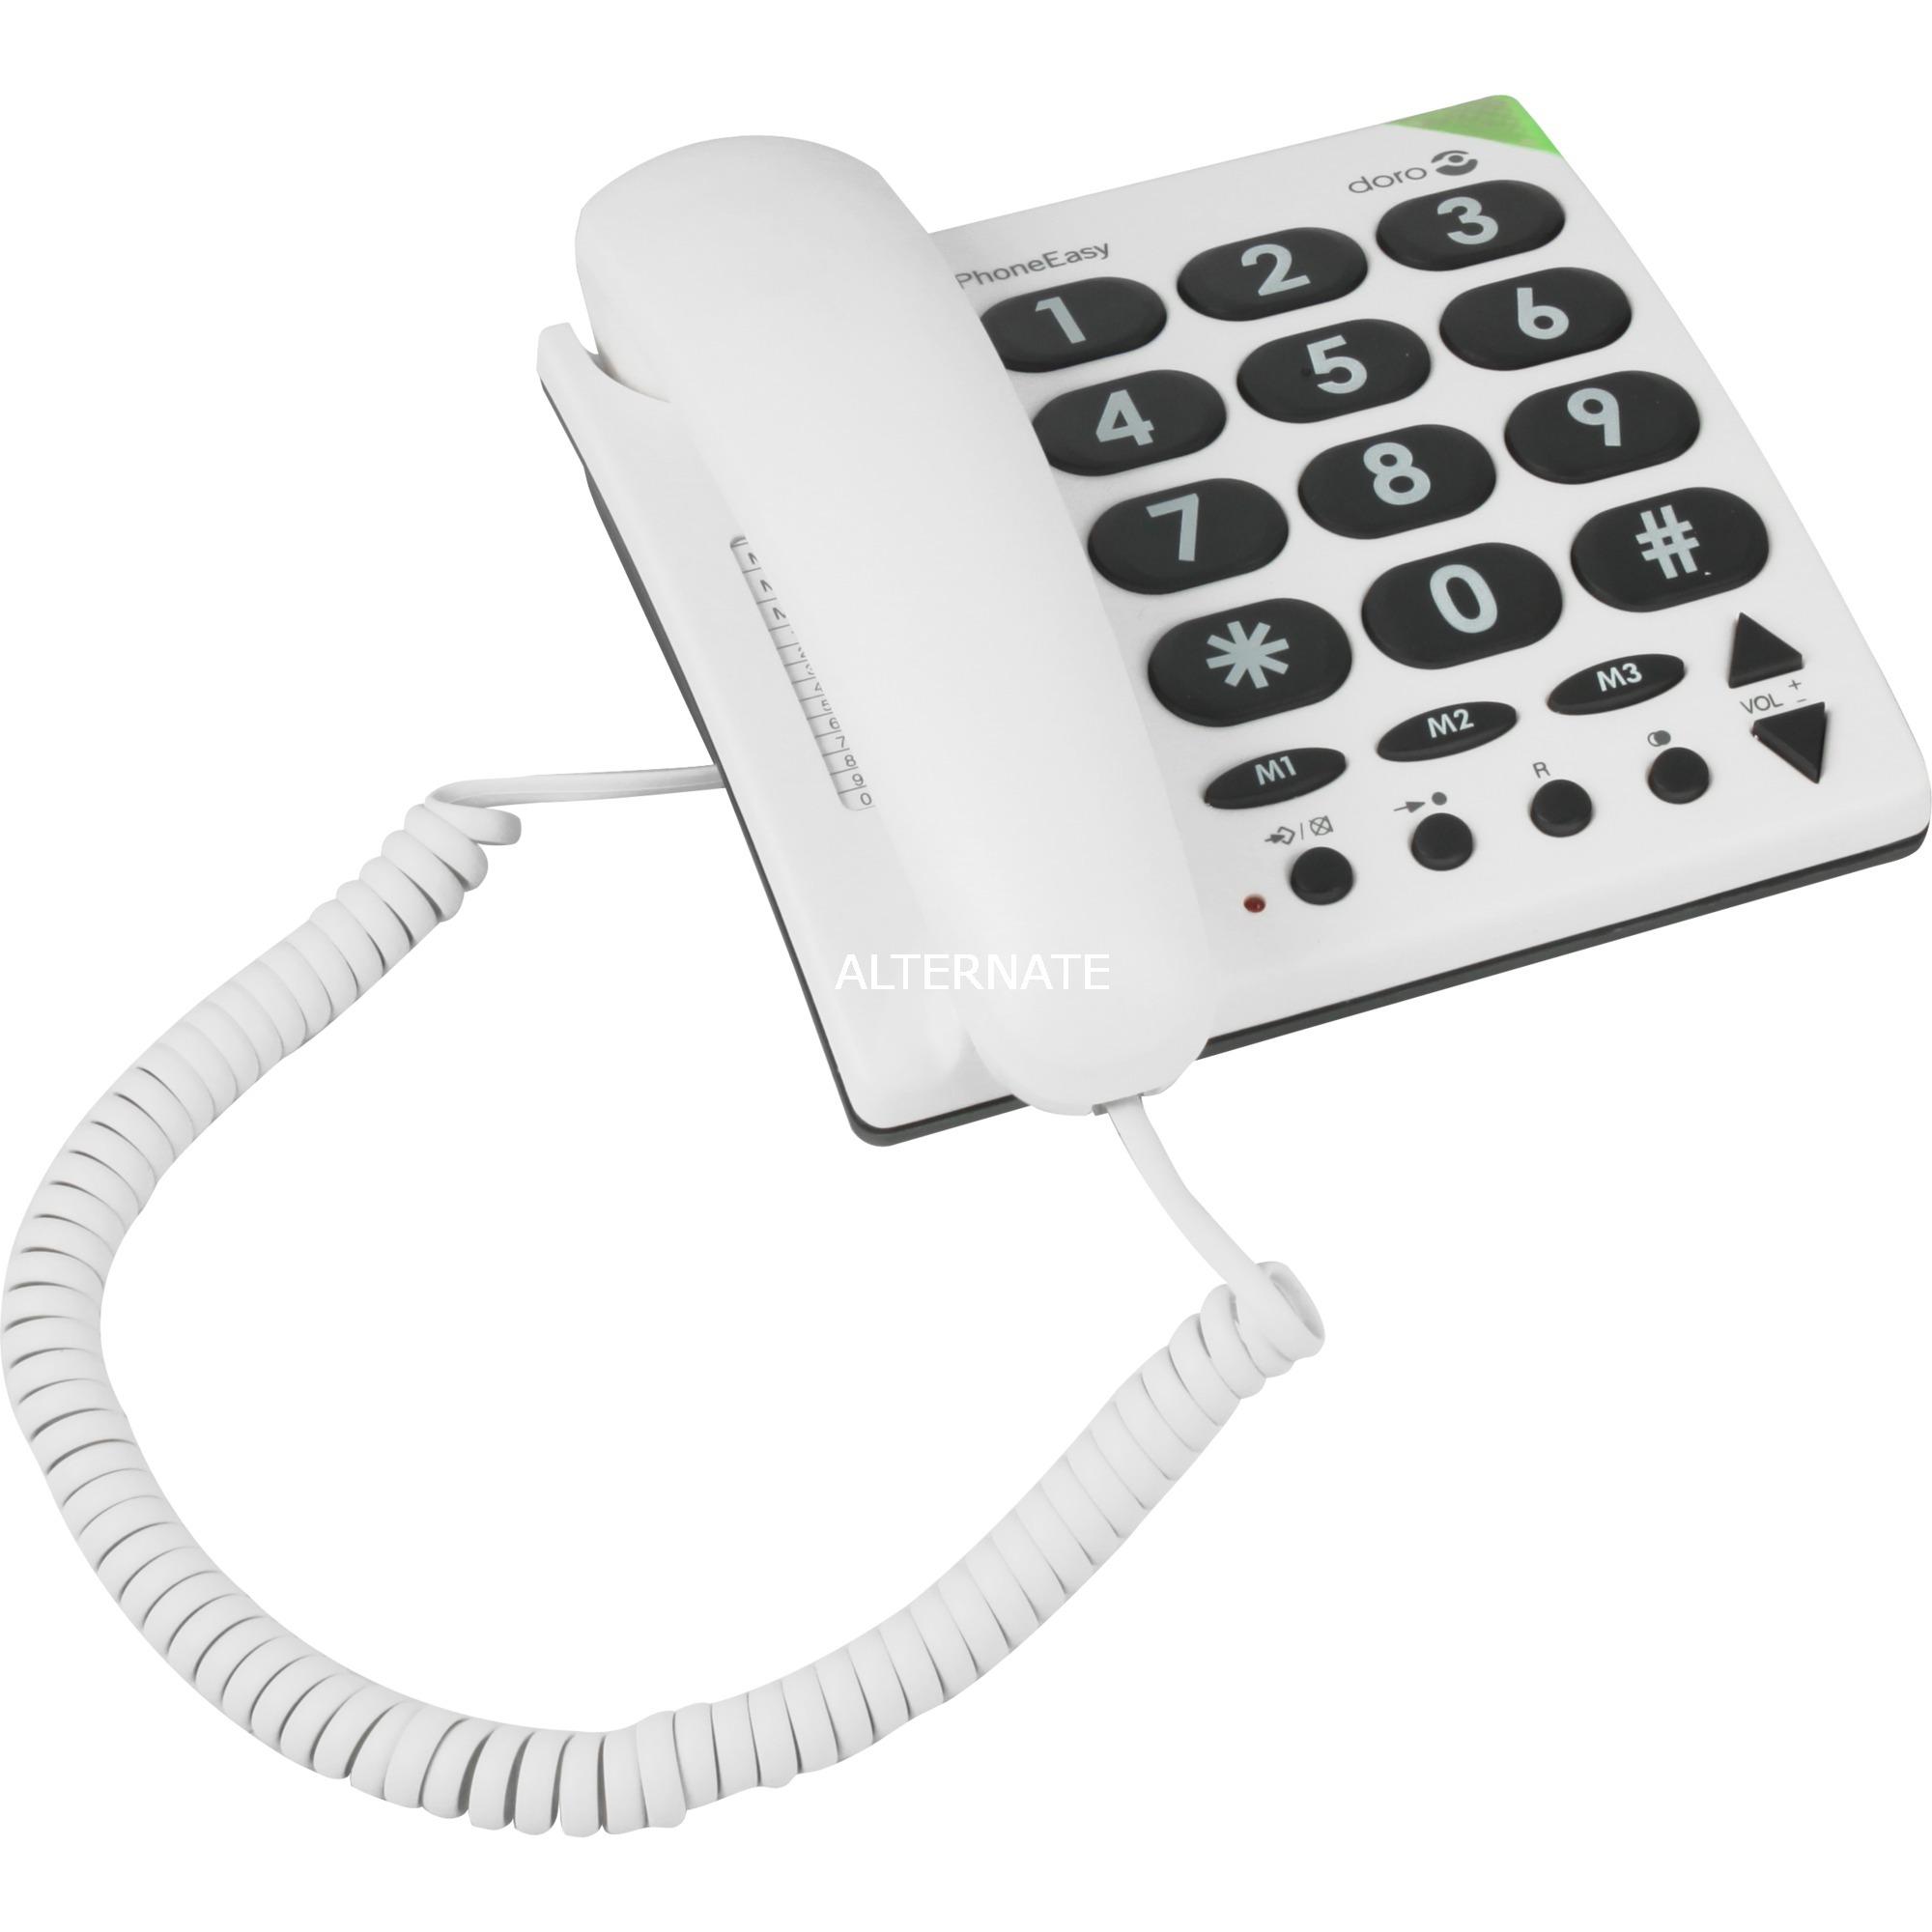 PhoneEasy 311c Teléfono analógico Blanco